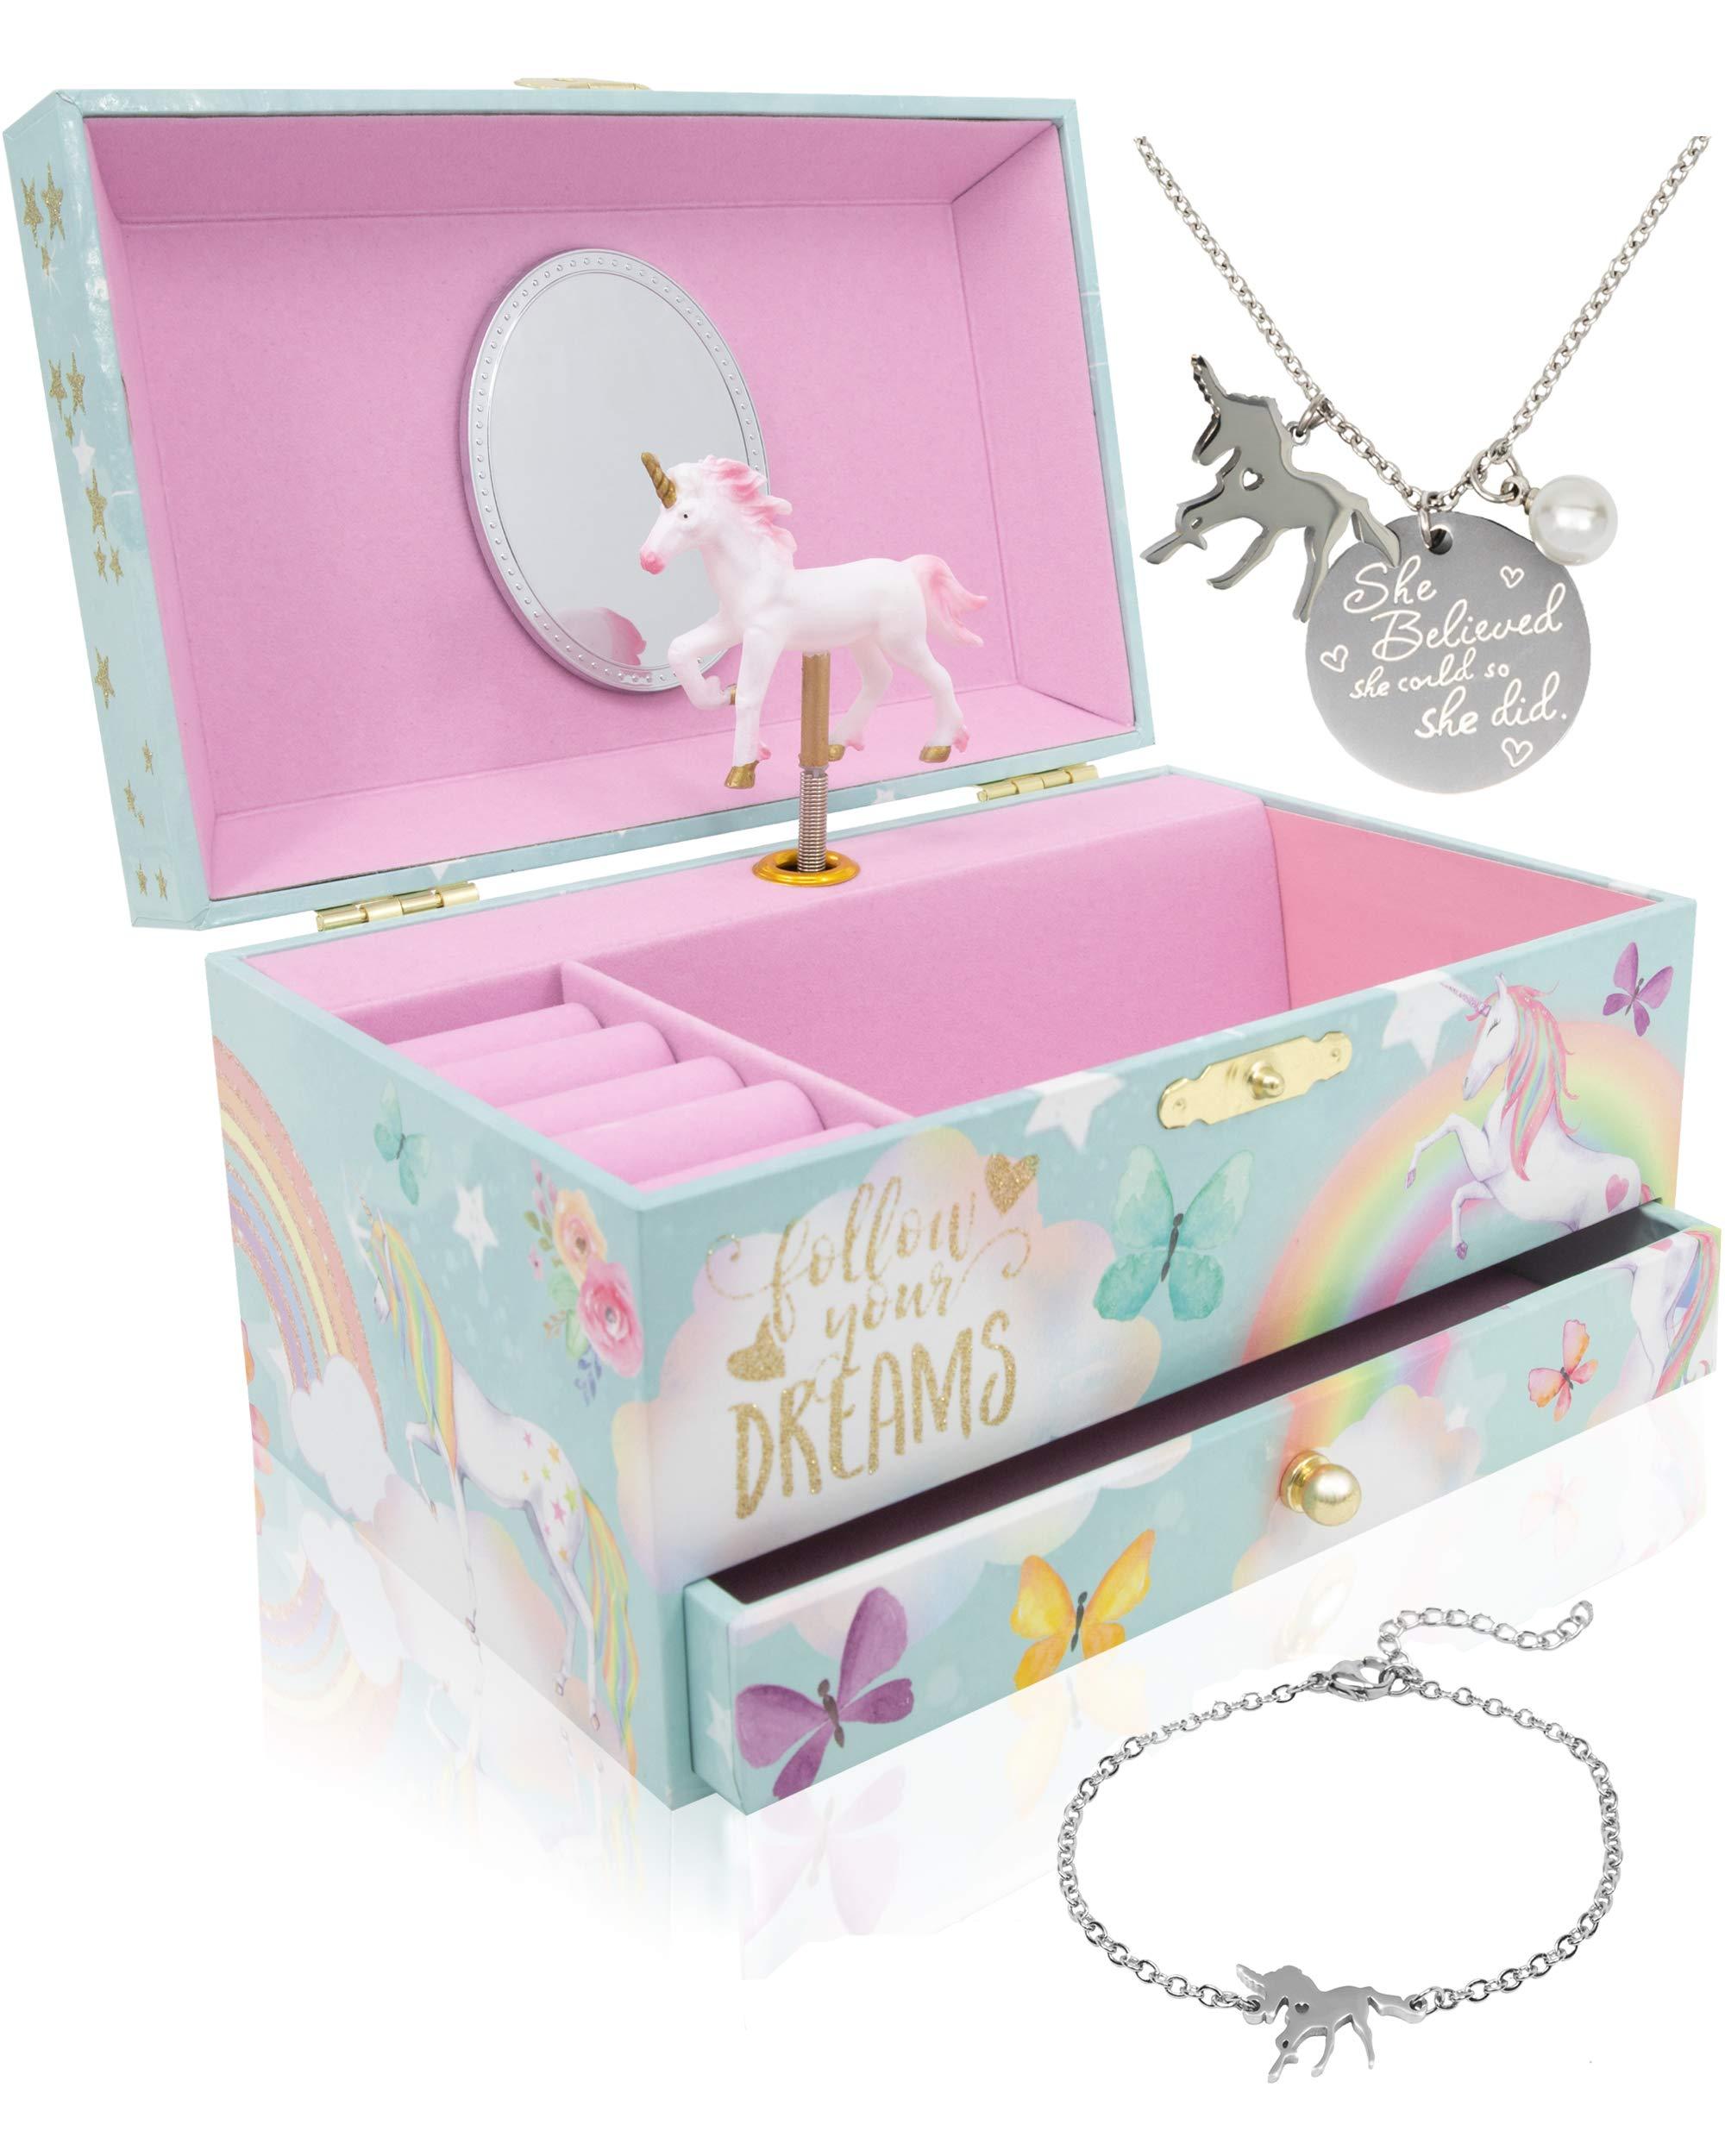 The Memory Building Company Unicorn Music Box & Little Girls Jewelry Set - 3 Unicorn Gifts for Girls by The Memory Building Company